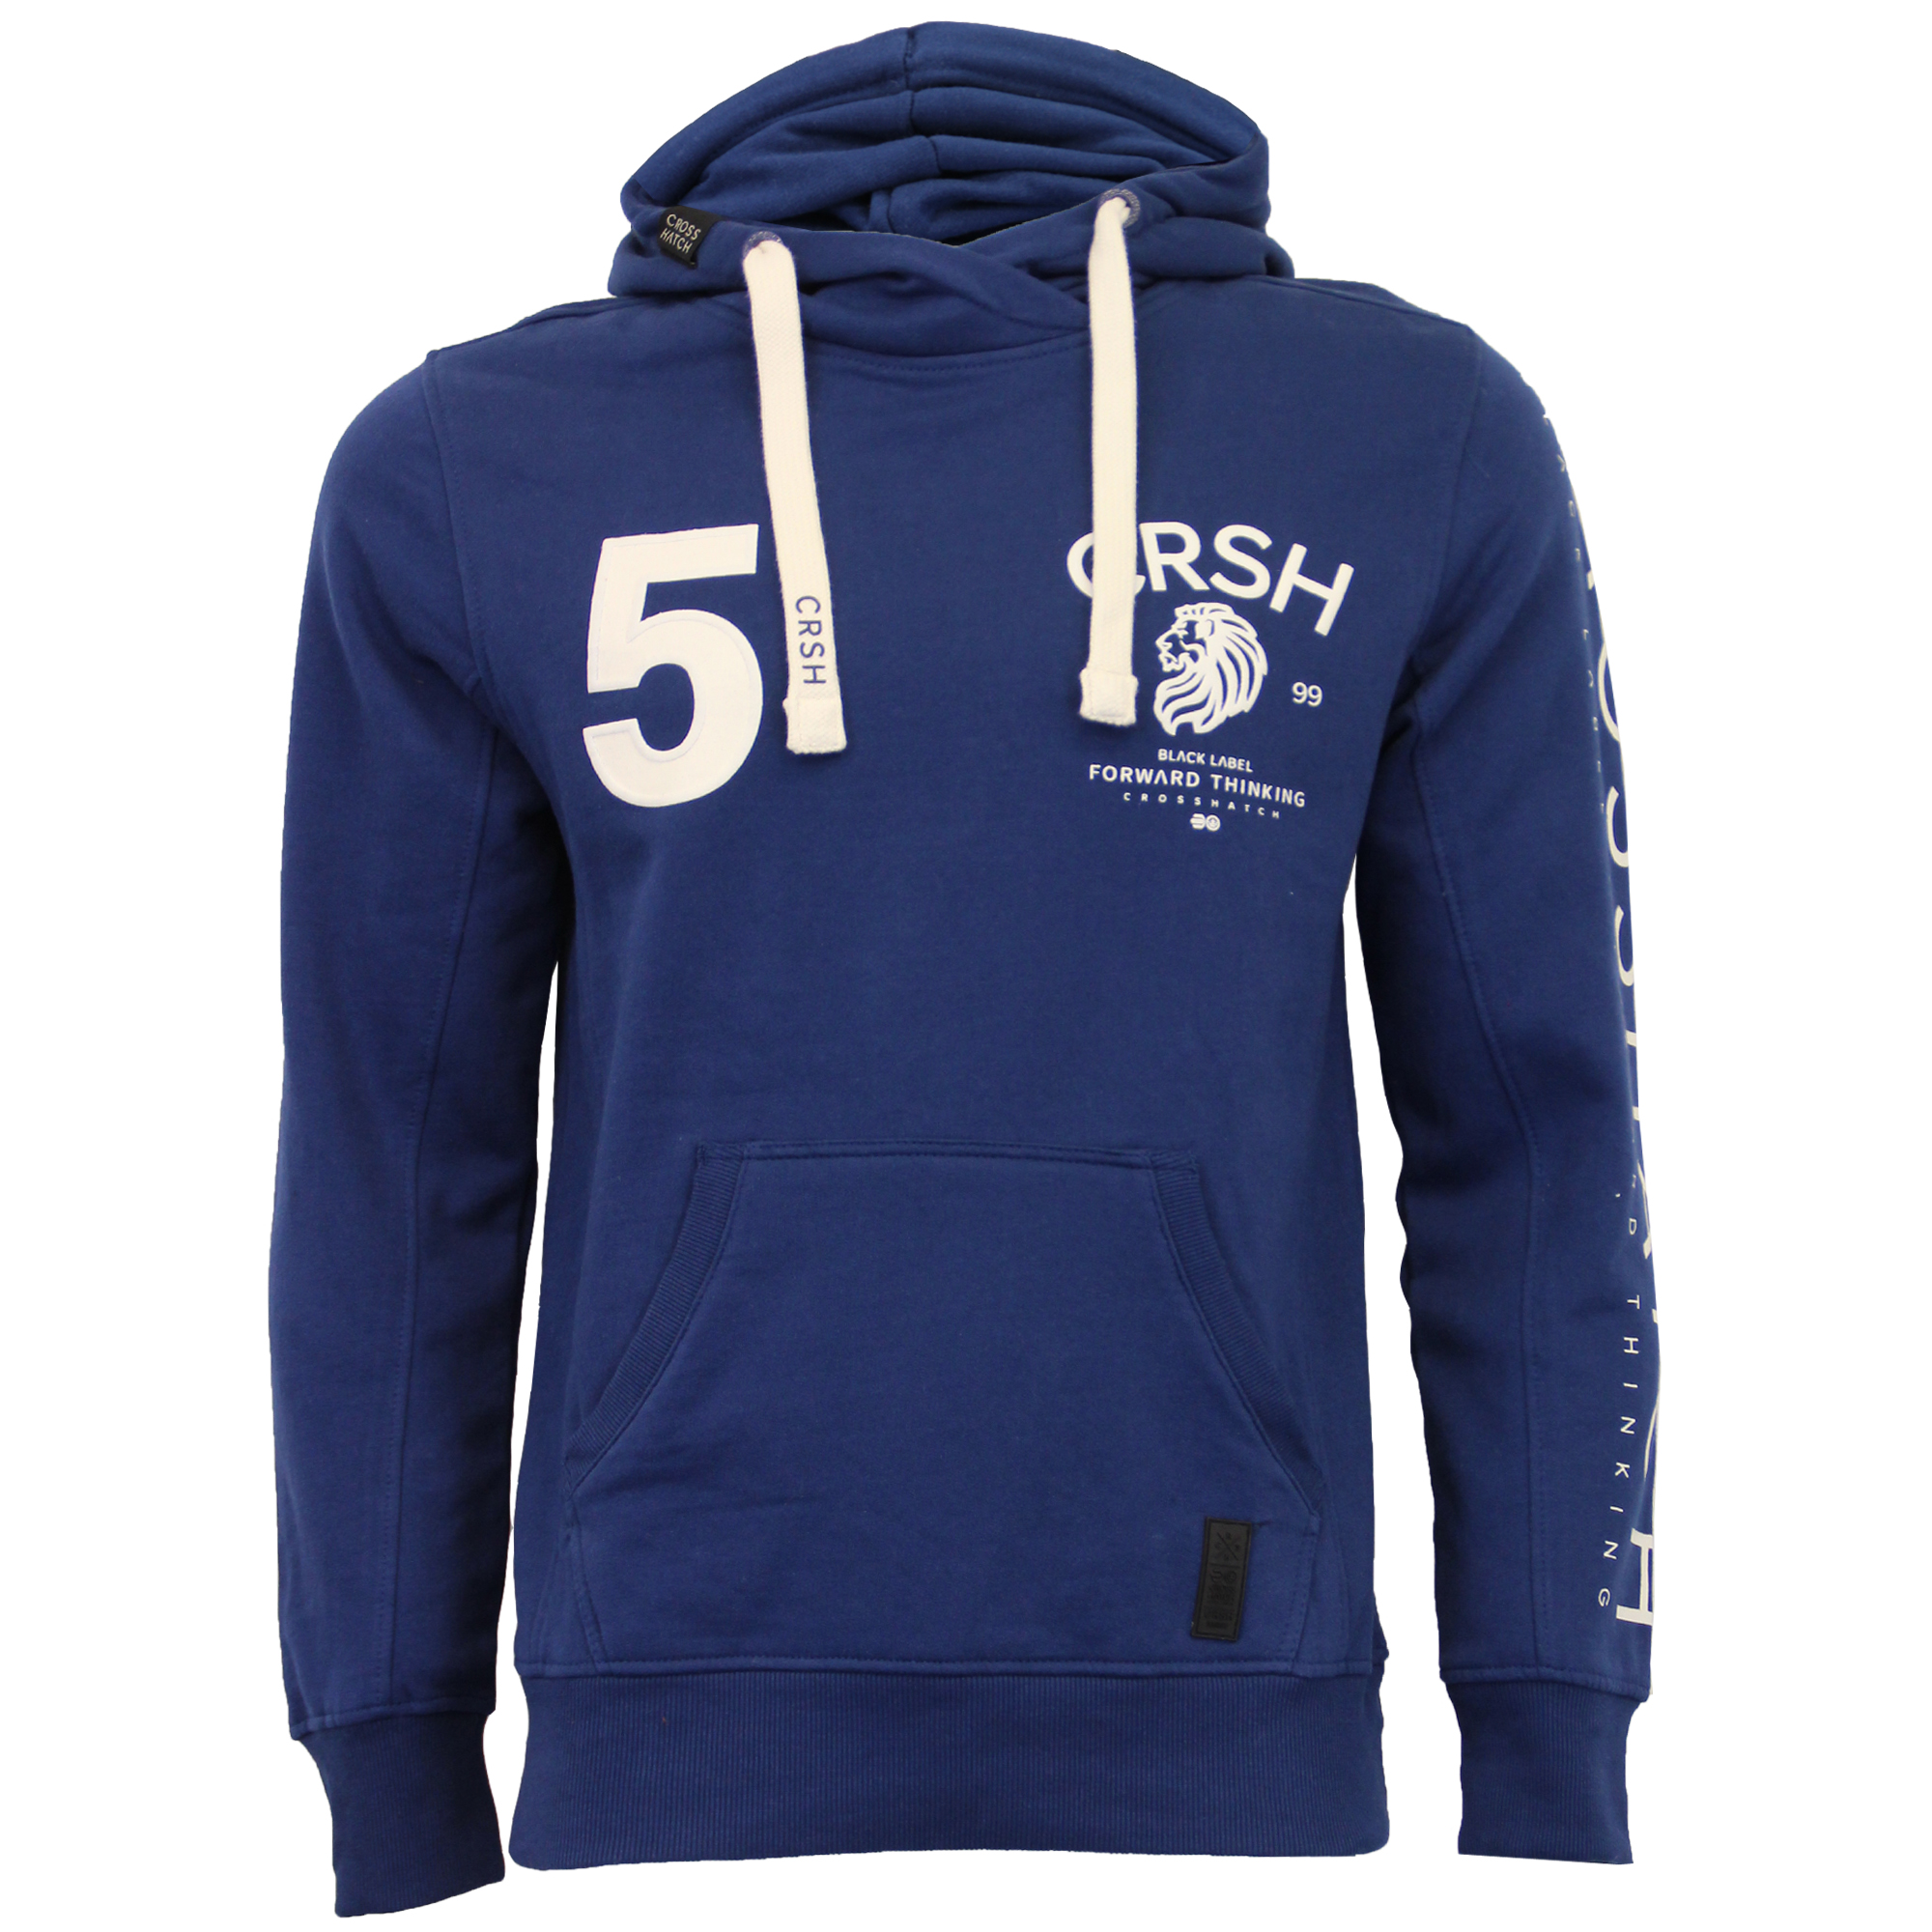 Mens-Sweatshirt-Crosshatch-Hoodie-Top-Embossed-Logo-Print-Sweat-Fleece-Lined-New thumbnail 6